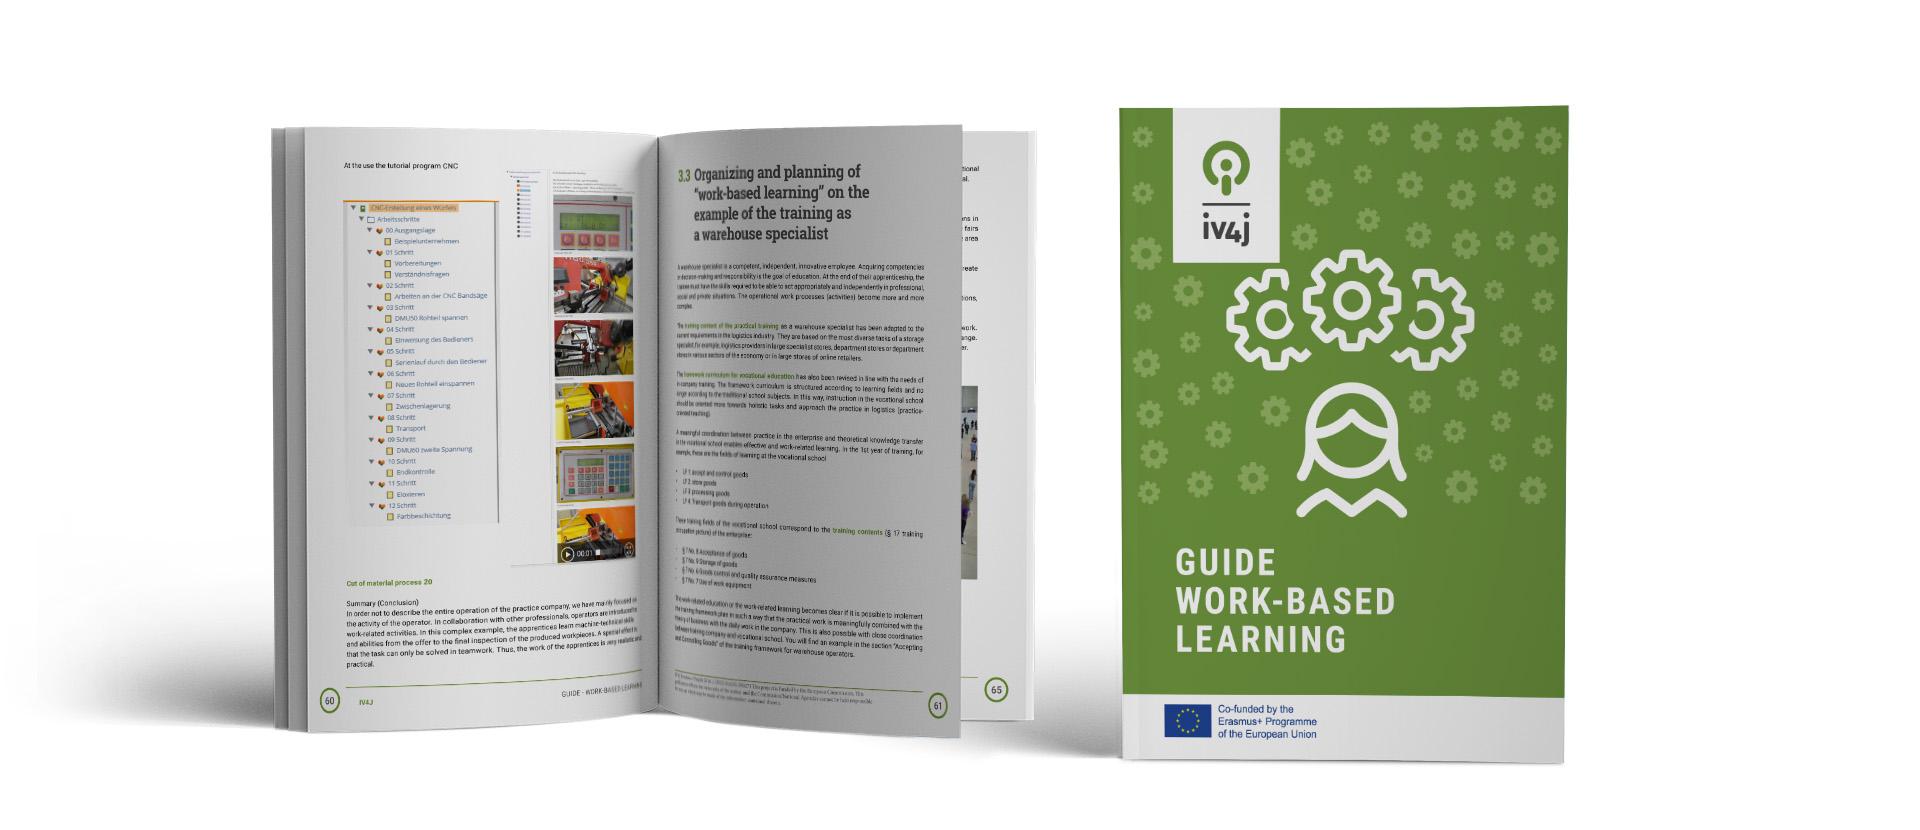 IV4j Worg Based Learning Guide